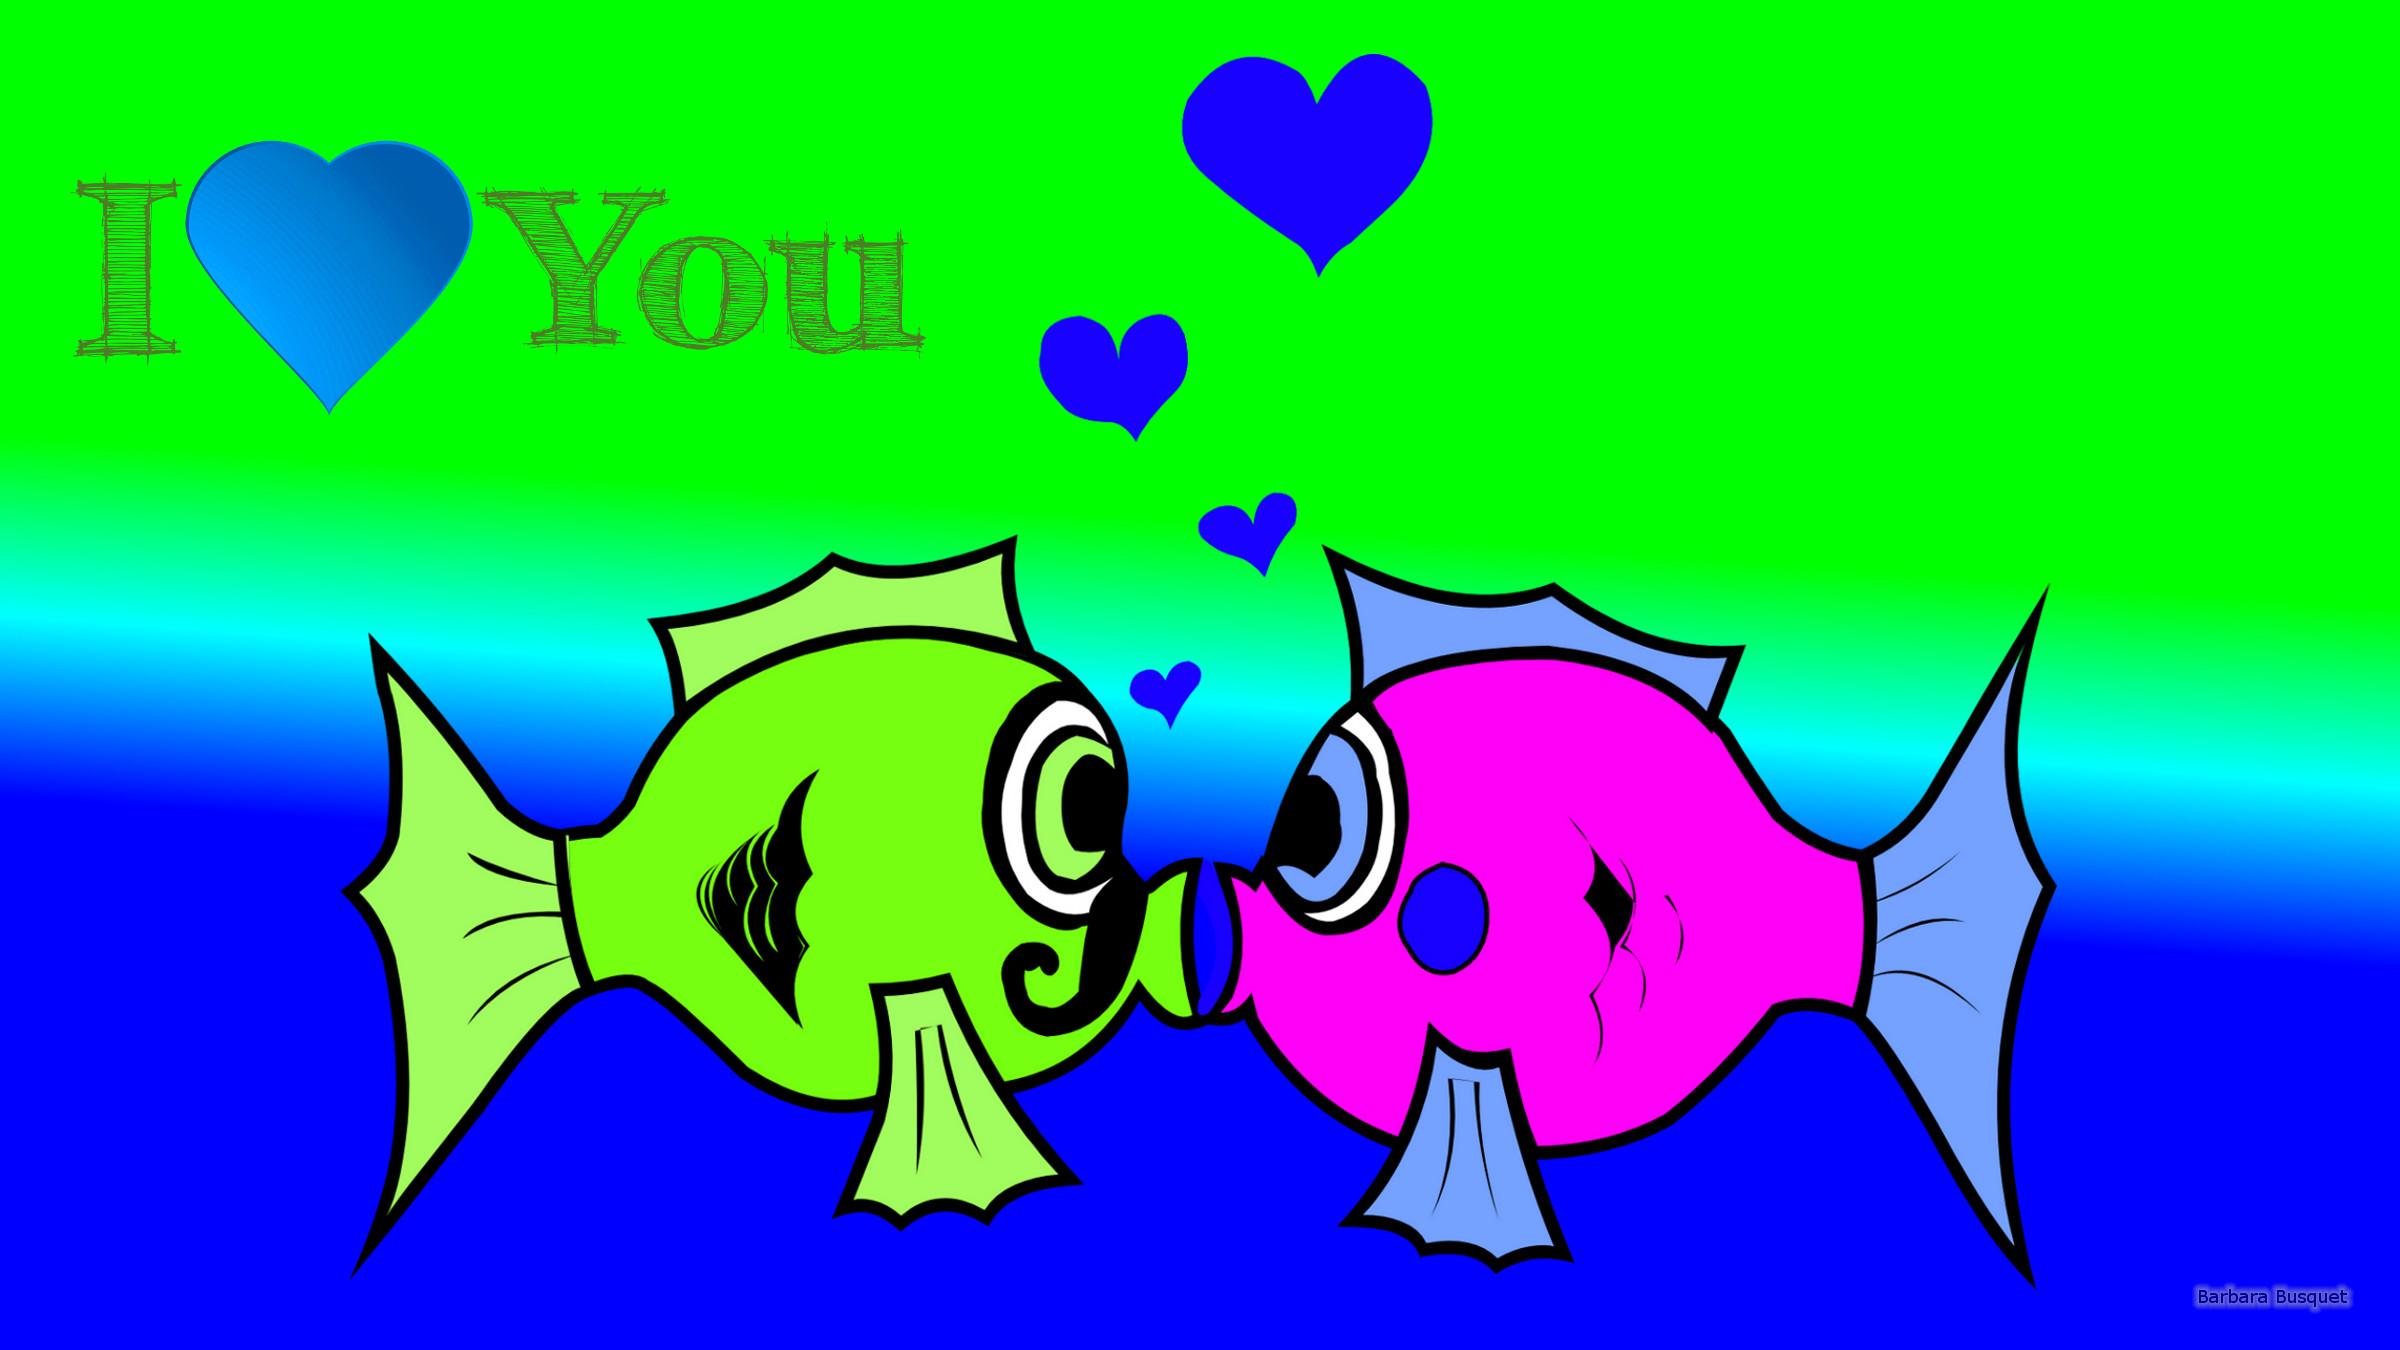 Koi fish Wallpapers - Barbaras HD Wallpapers